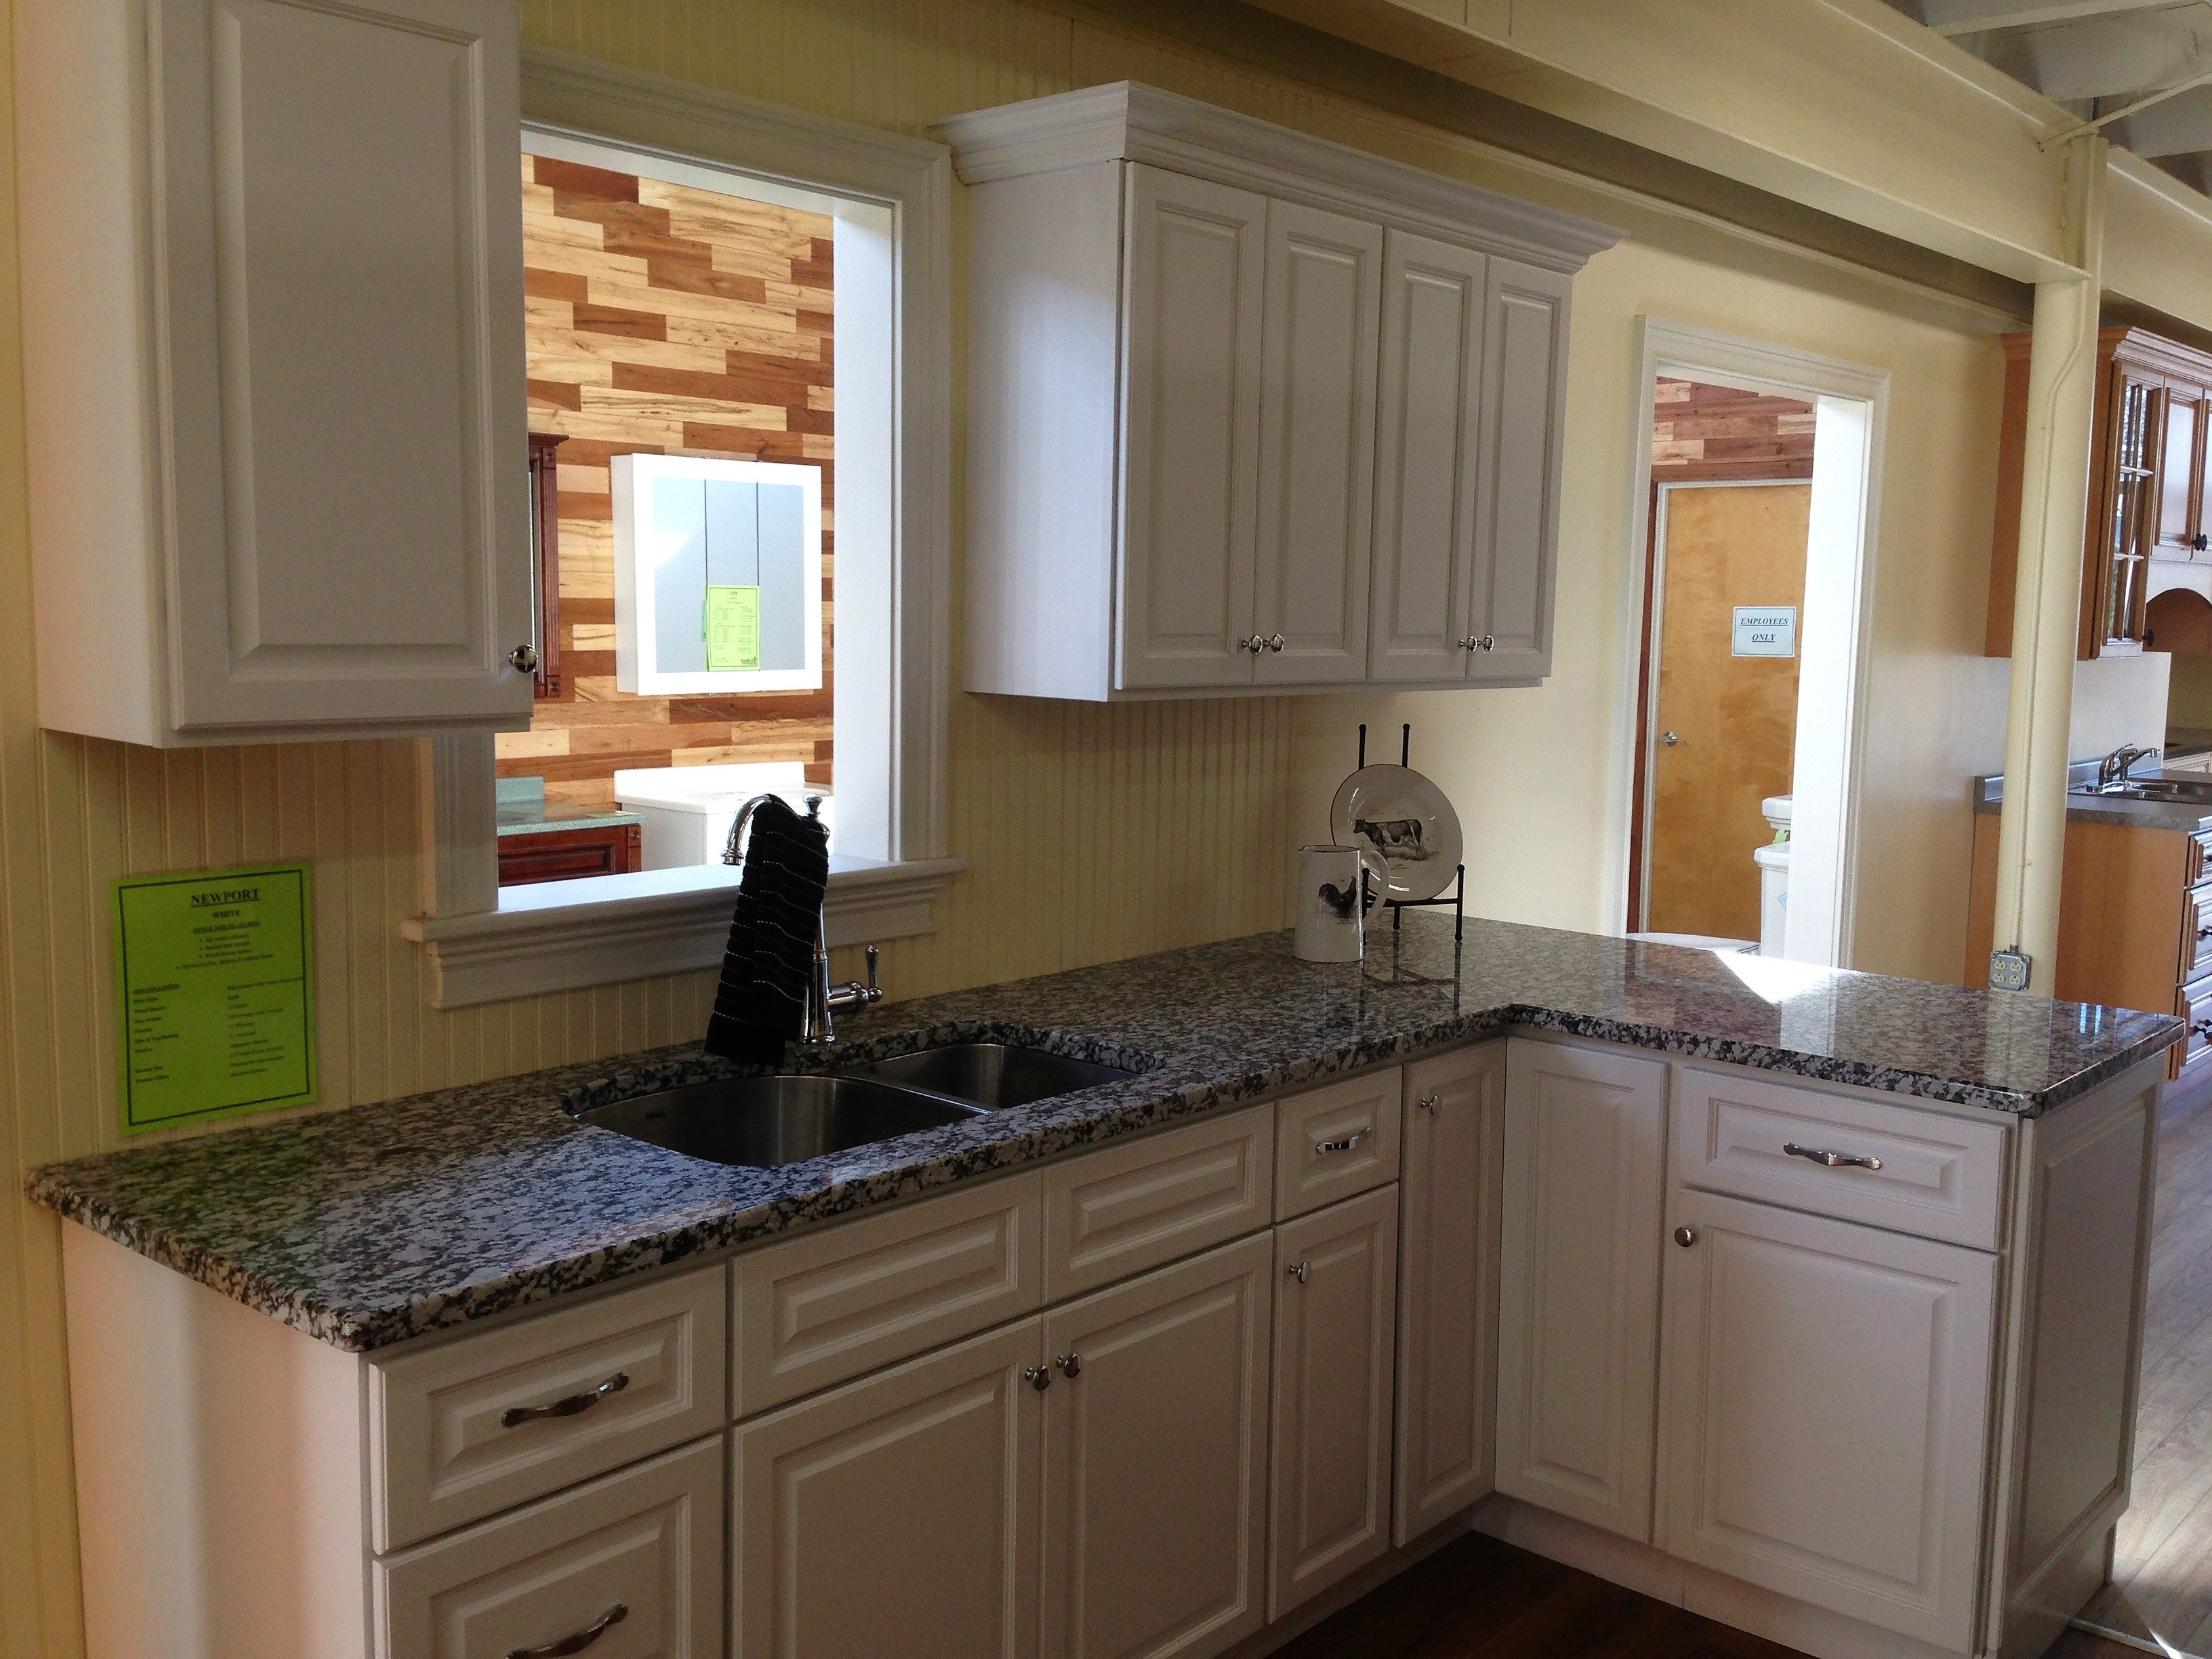 gran perla granite kitchen kitchen and bath countertops on farmhouse kitchen granite countertops id=26246